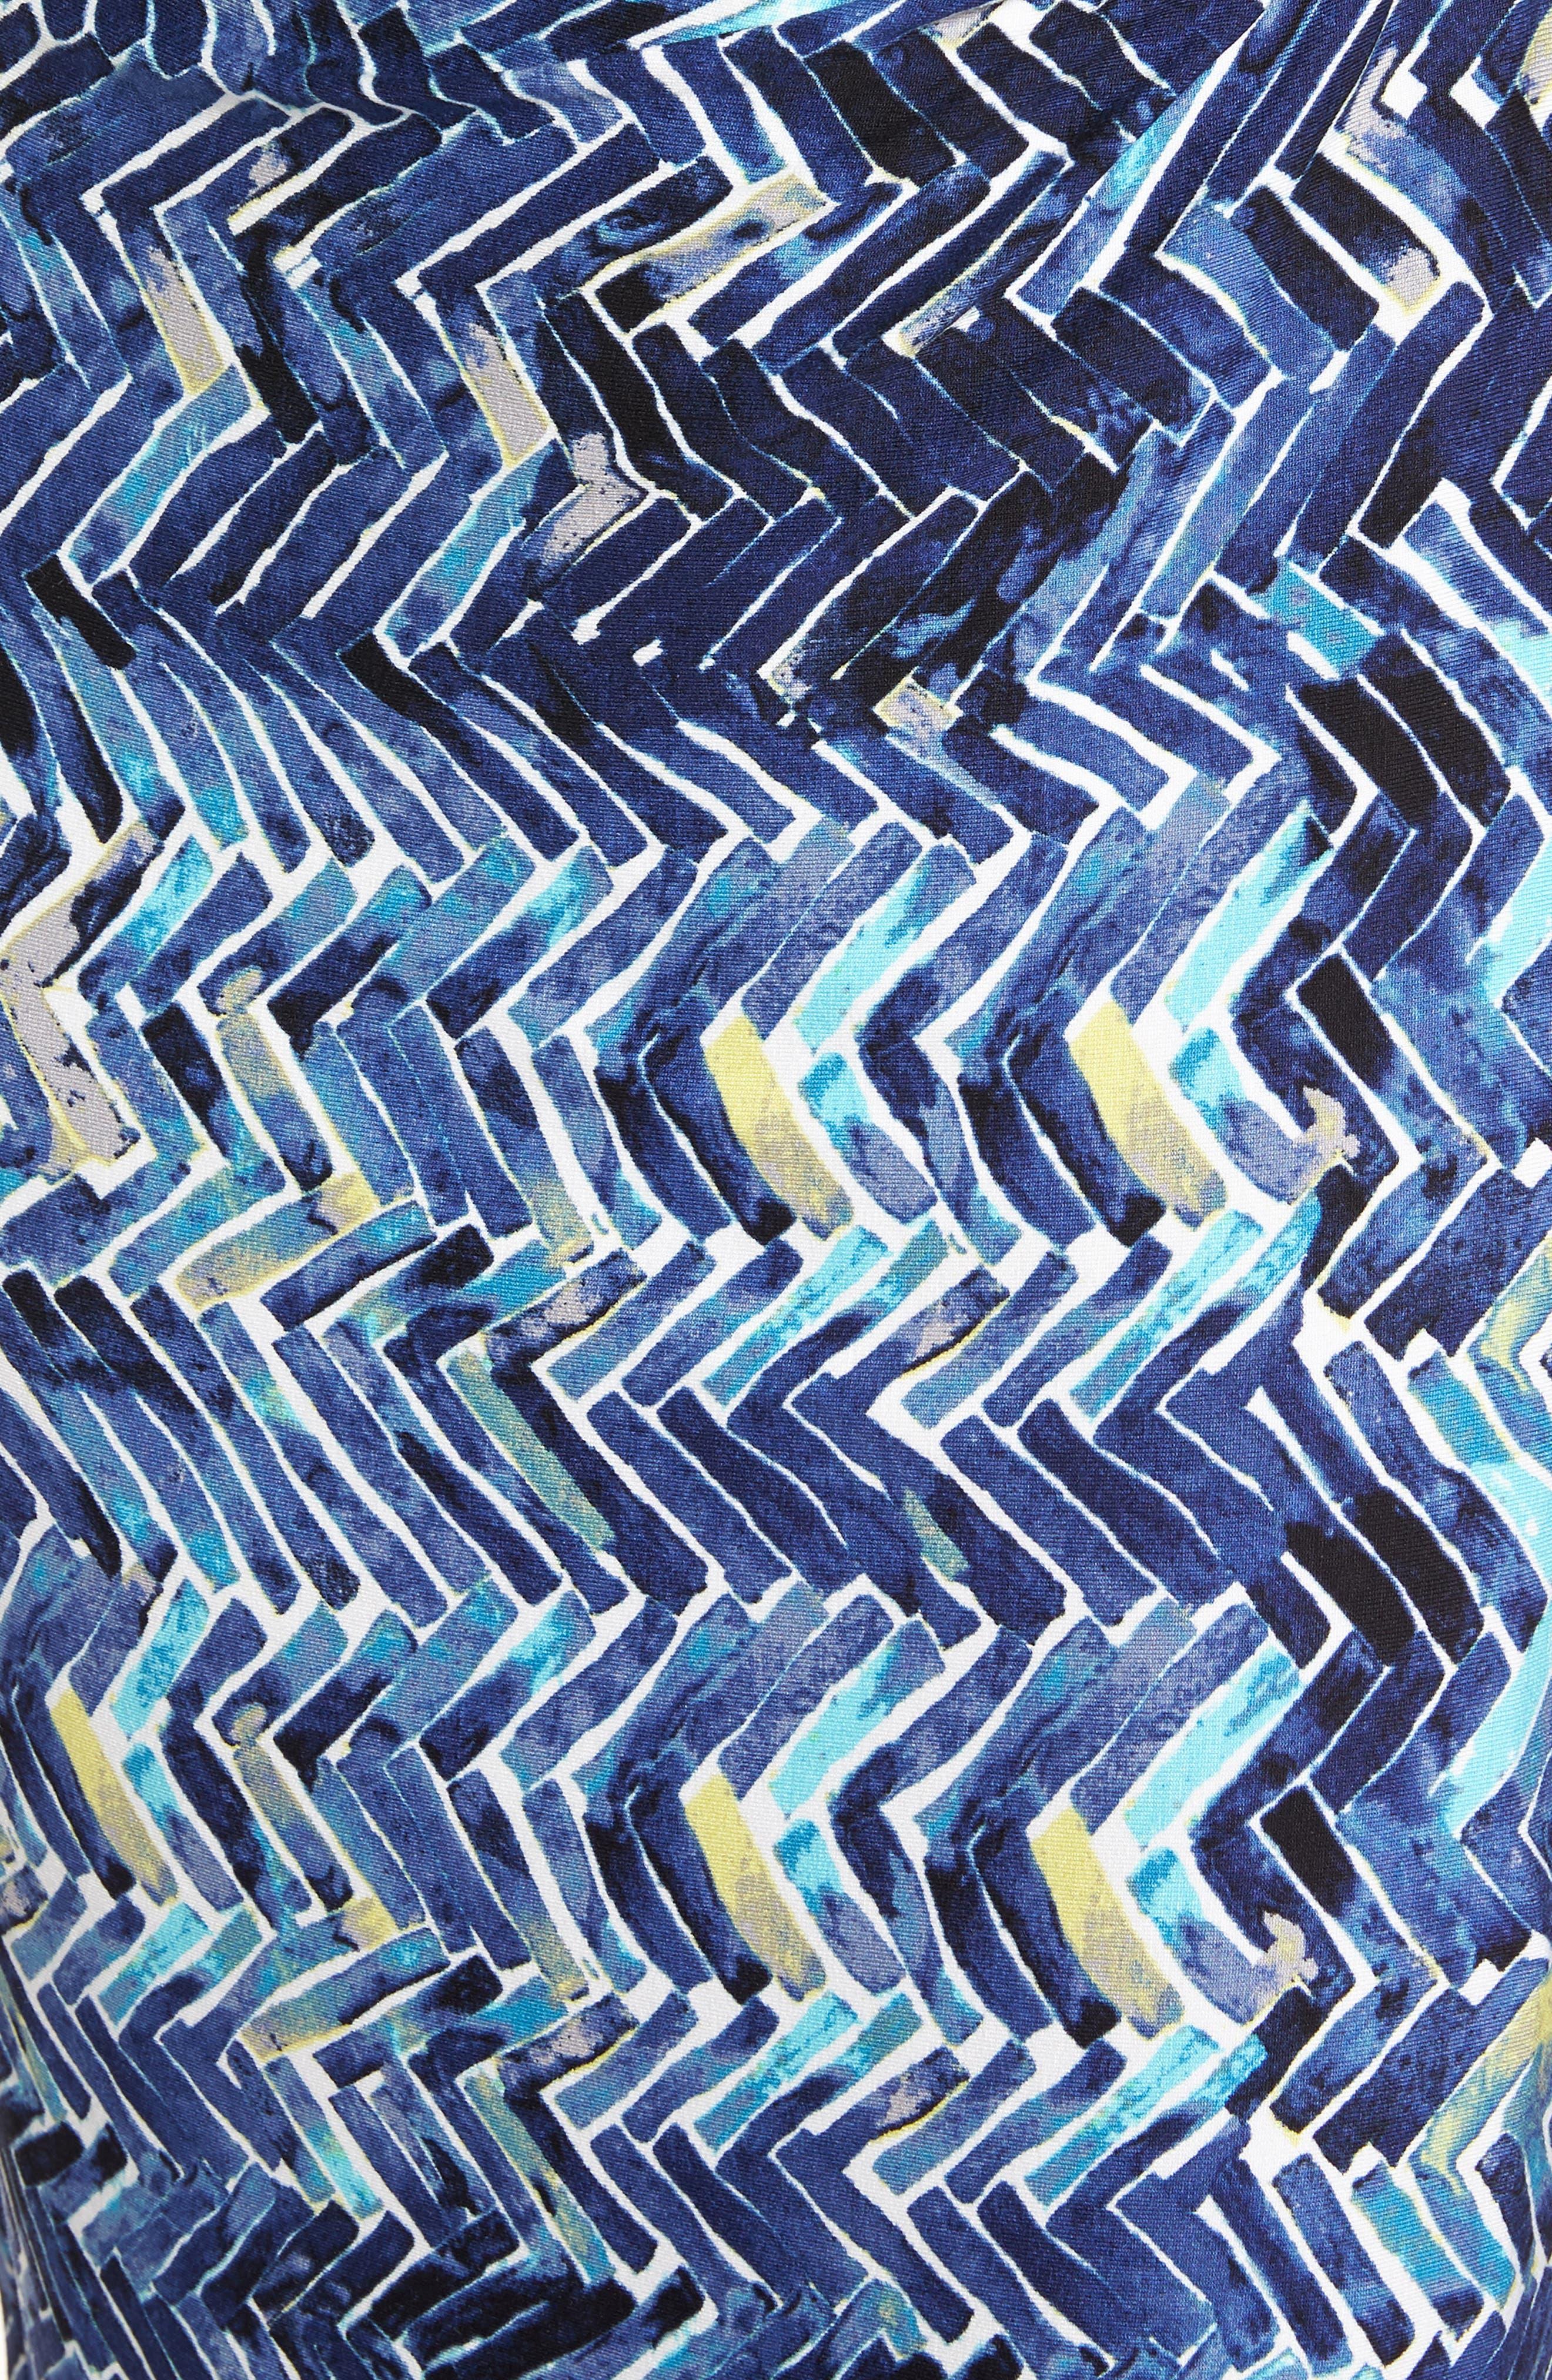 Seaside Tile Ruched Sheath Dress,                             Alternate thumbnail 5, color,